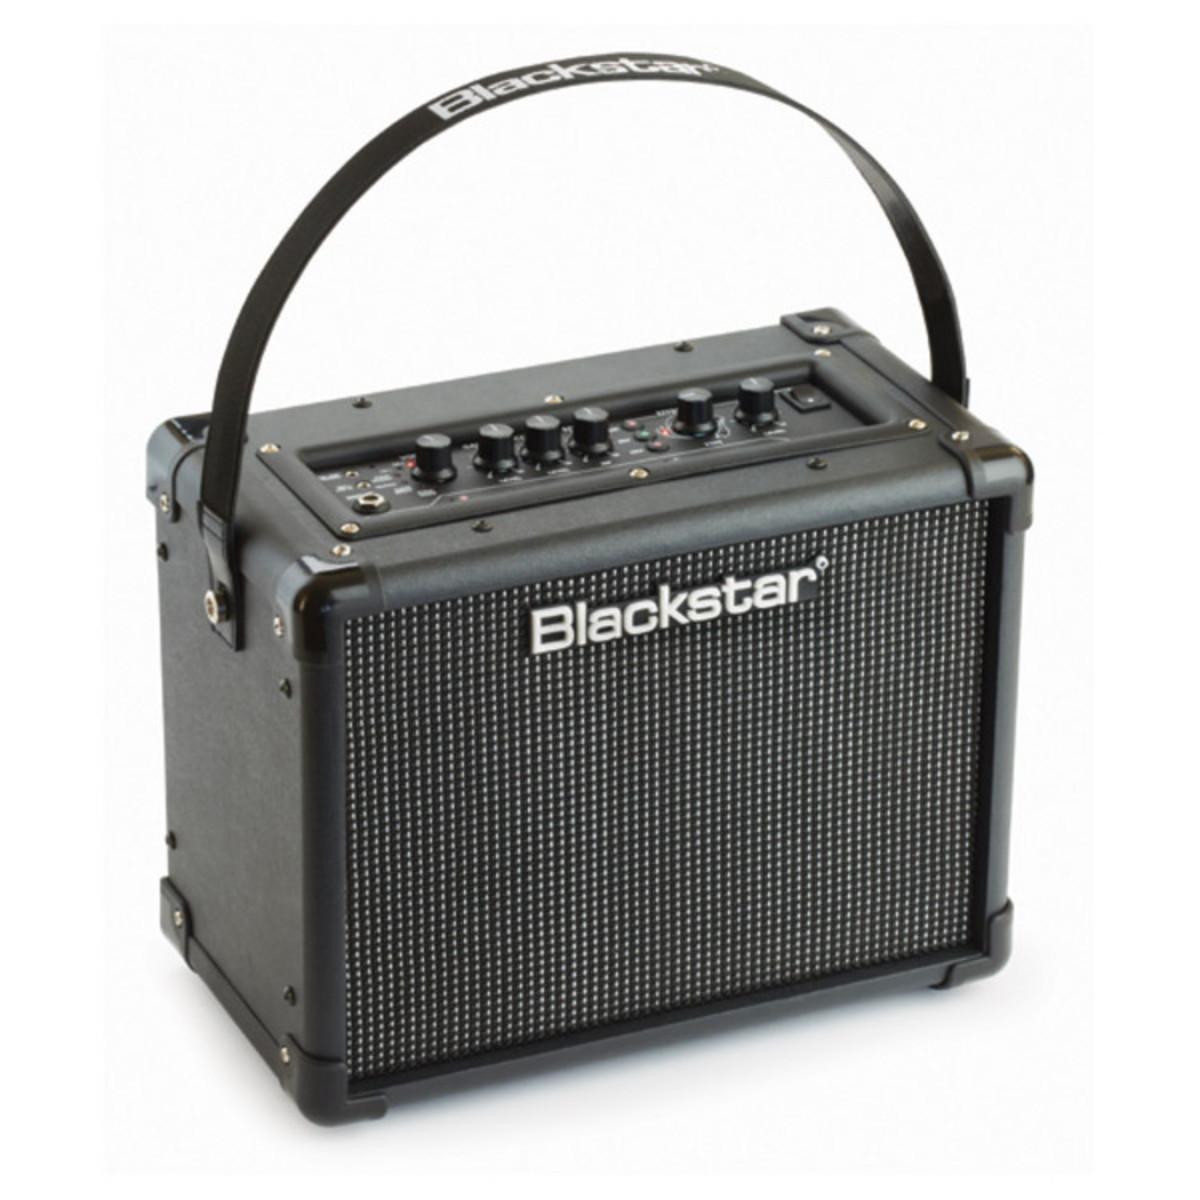 Image of Blackstar ID:Core 10 Stereo 10 Watt (2x5W) Combo Amp